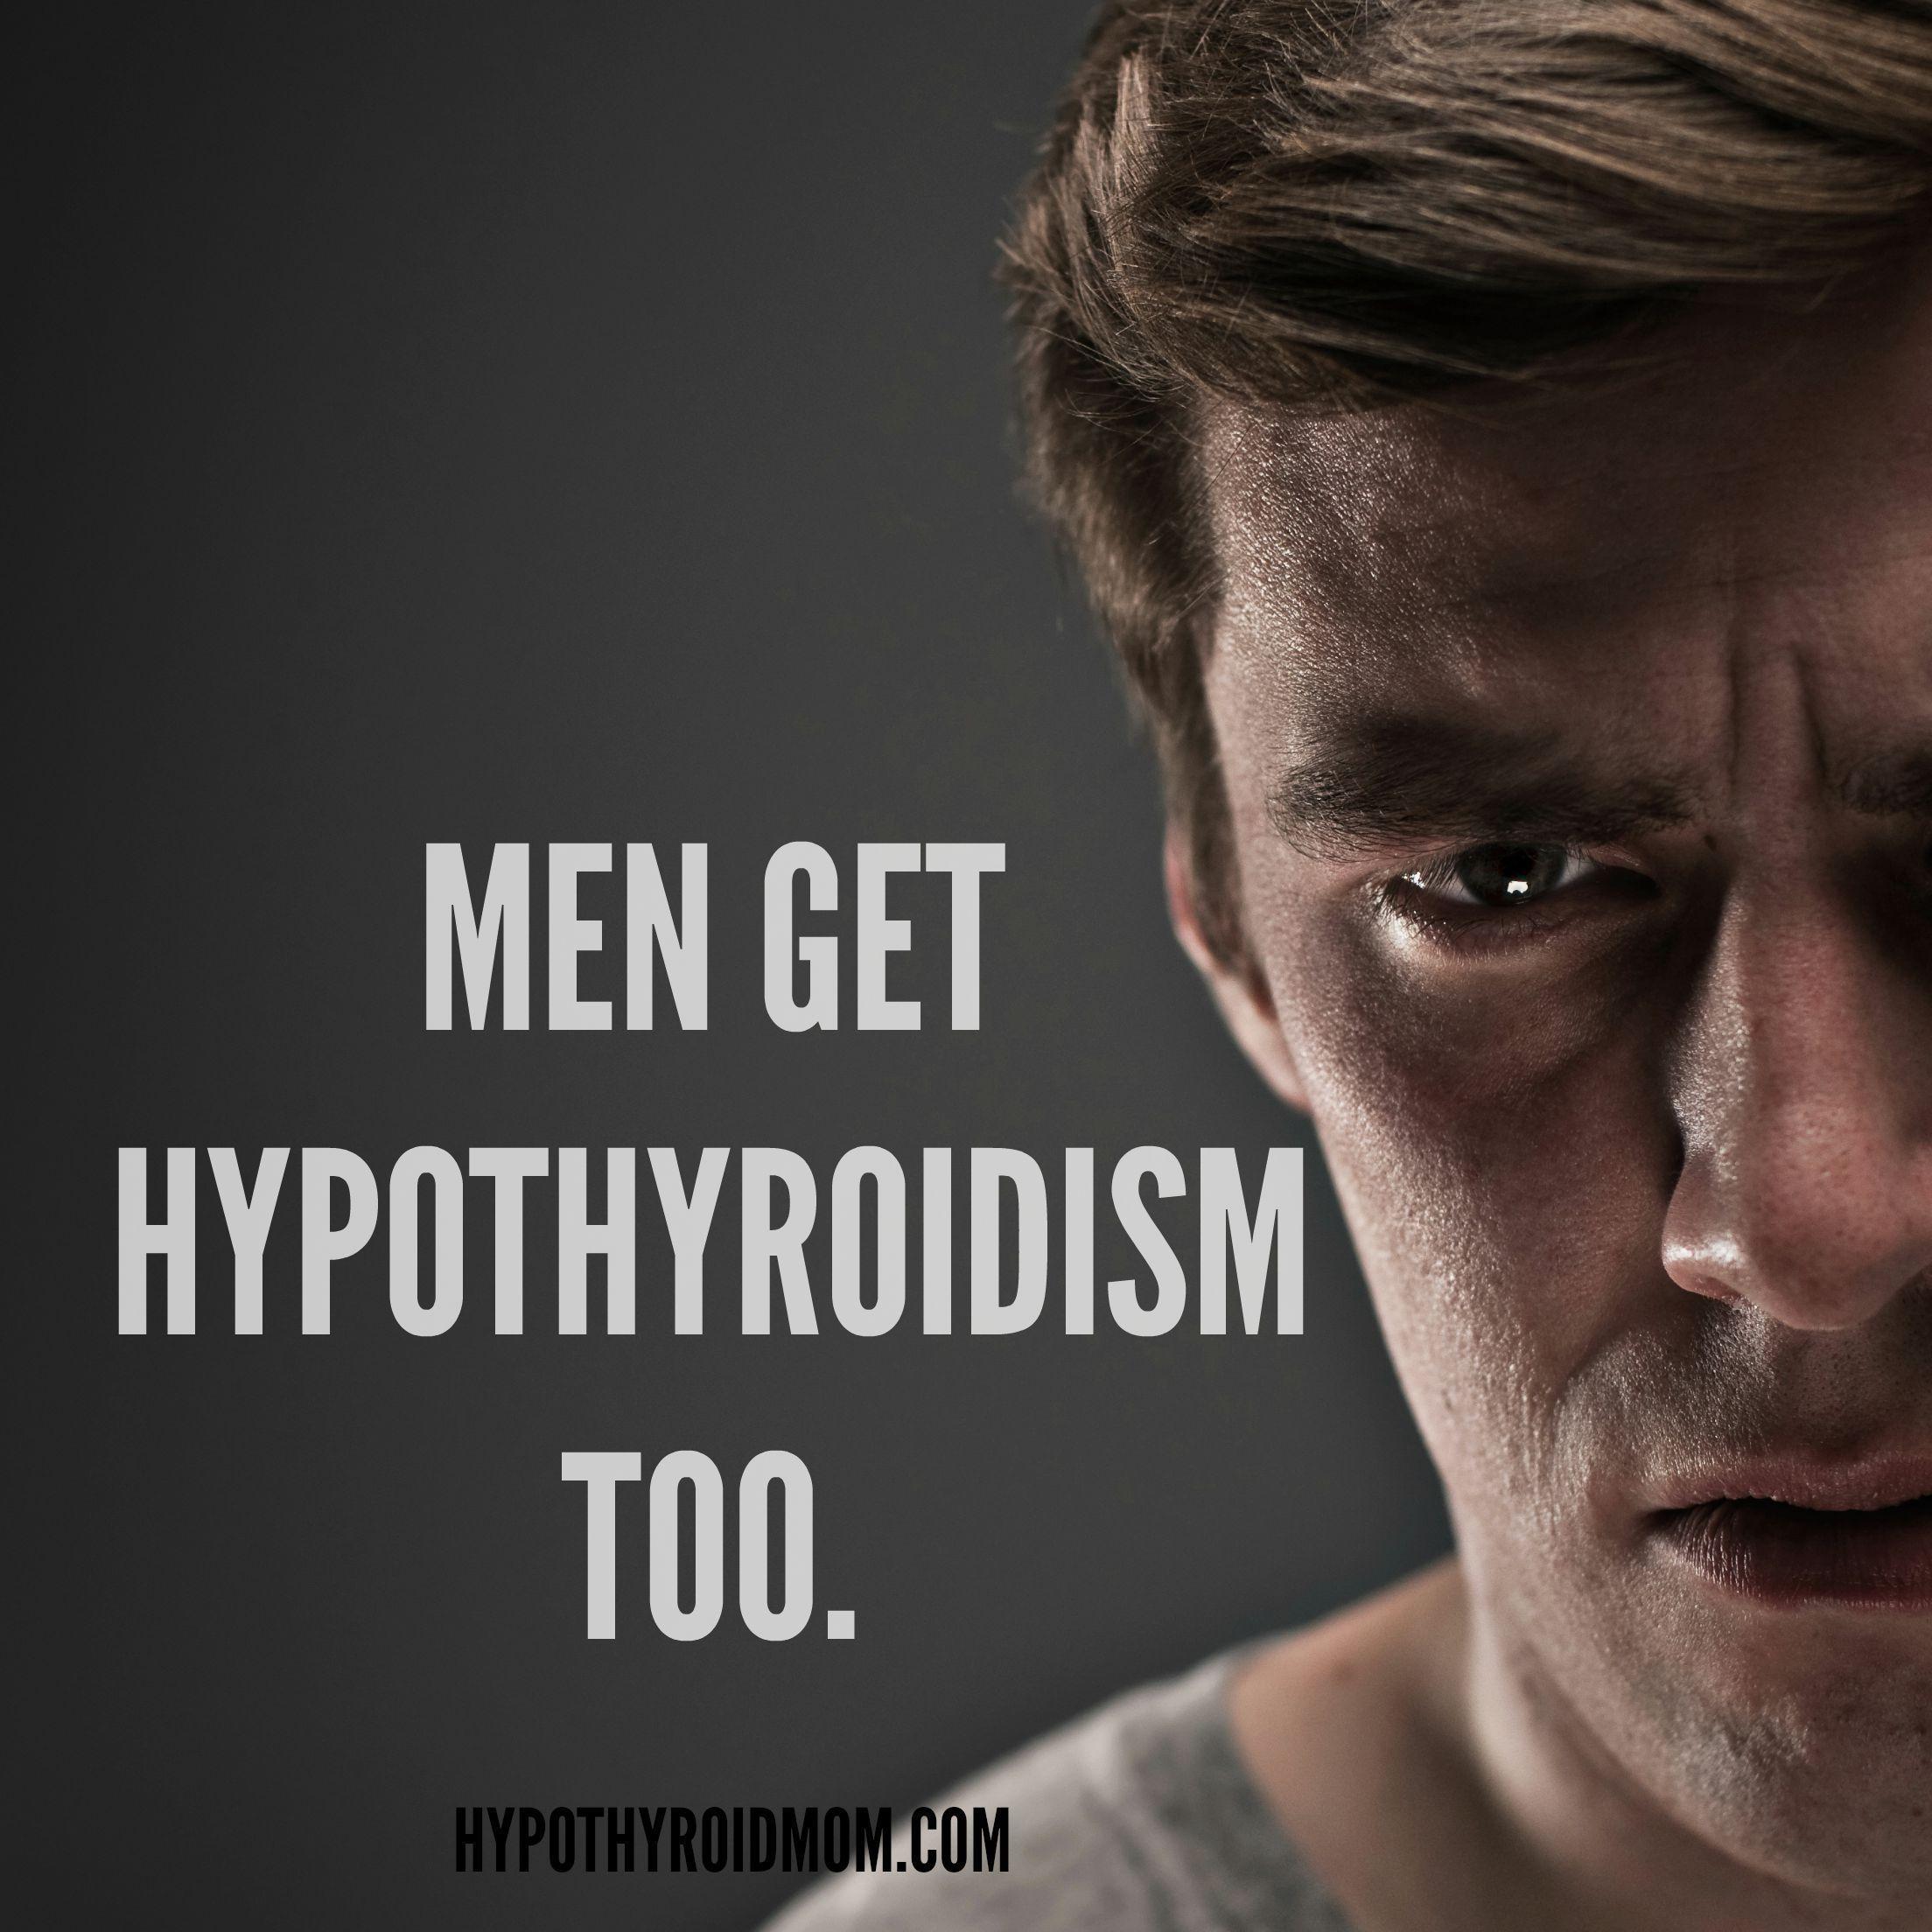 Men Get Hypothyroidism Too Hypothyroidmom Com Hypothyroidism Treatment Hypothyroidism Natural Treatment Thyroid Problems In Men